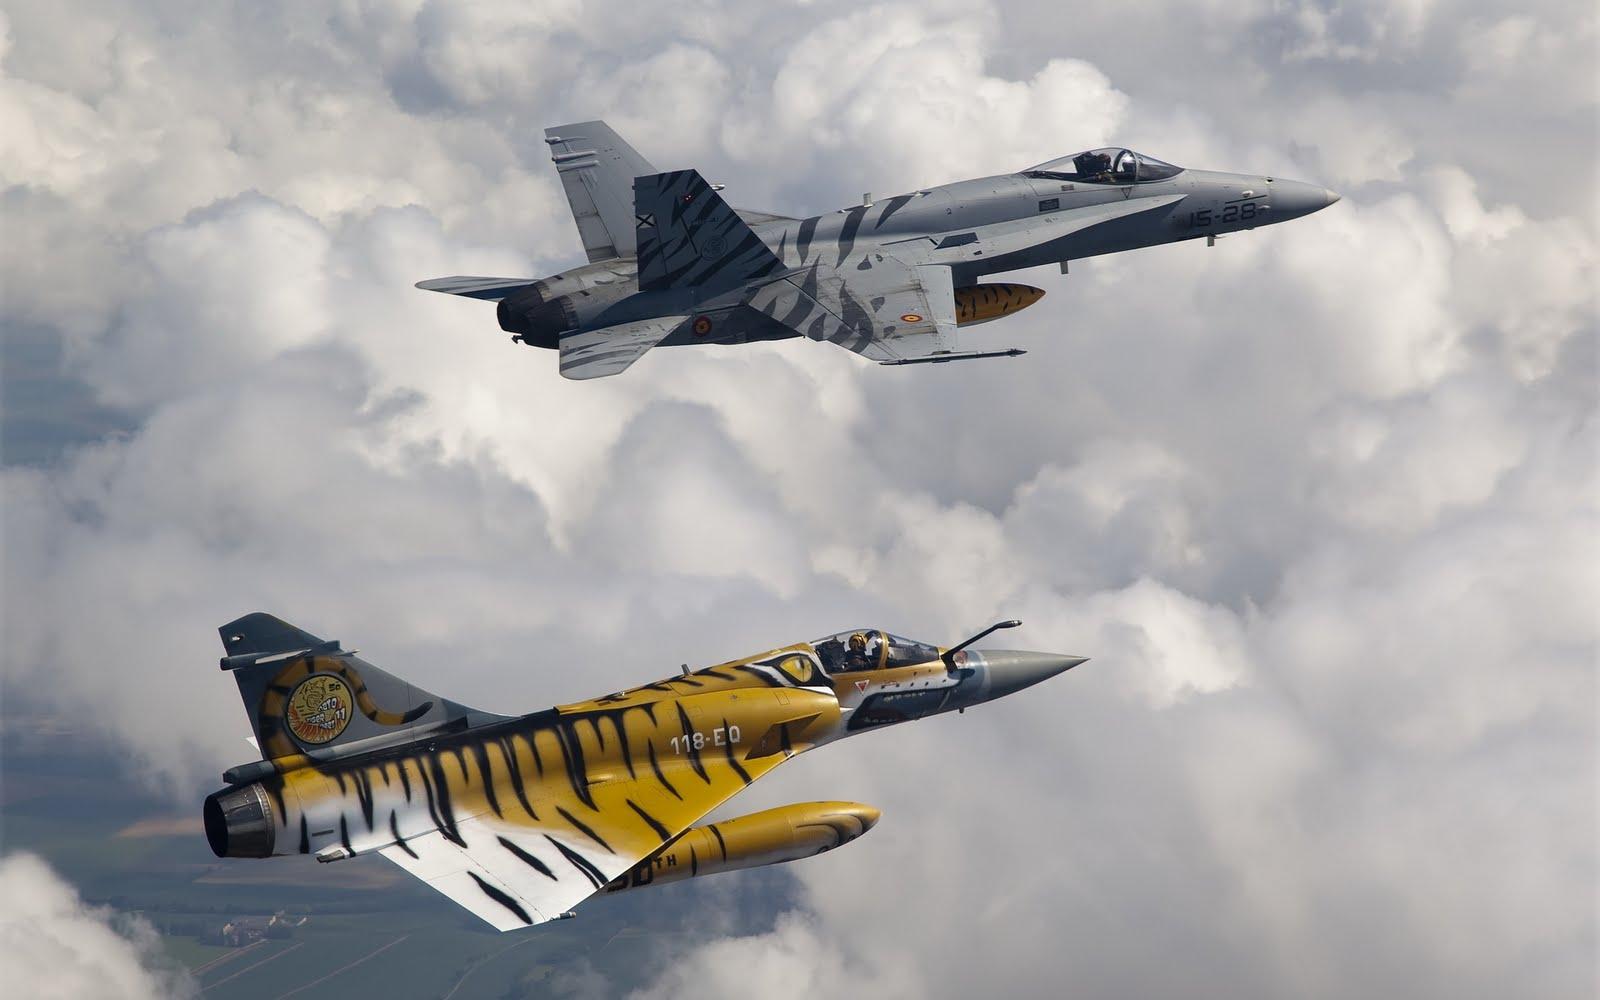 http://4.bp.blogspot.com/-dr6Gx9Nu0BE/Tvvhe_3fV4I/AAAAAAAABKA/ut4tody-gwA/s1600/aircraft-wallpaper-Soppeng.Com.jpg